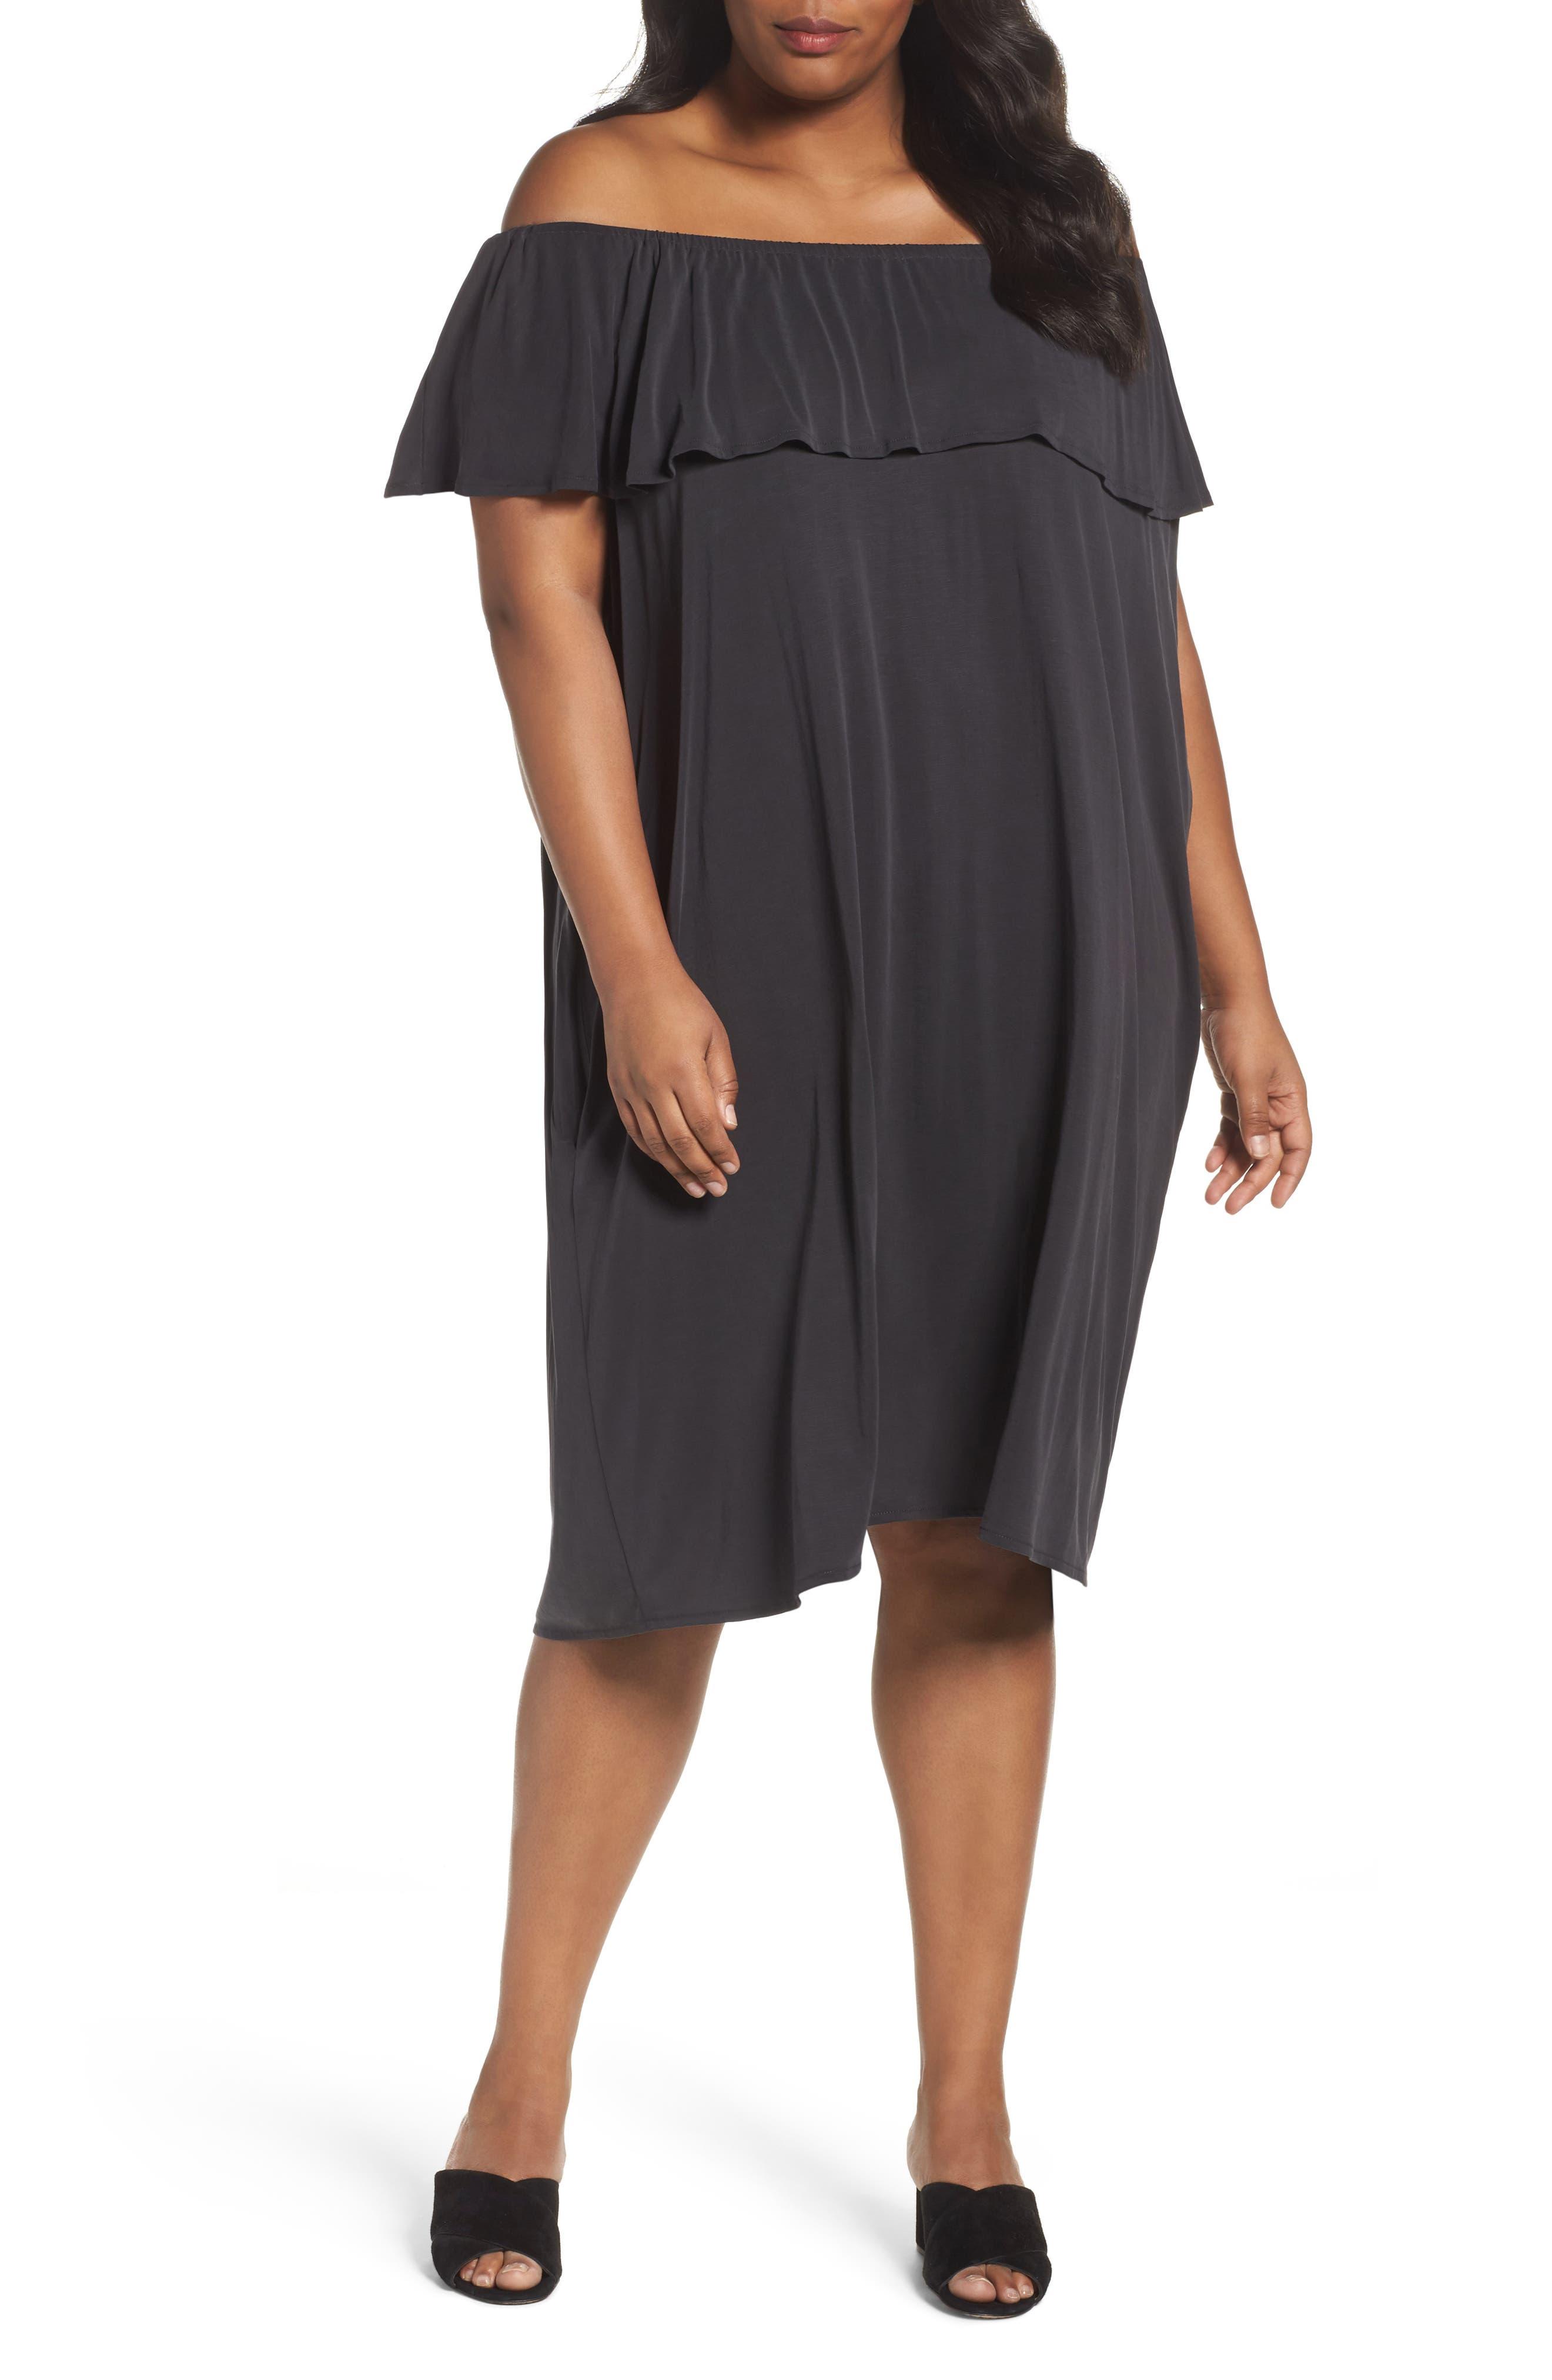 Boardwalk Convertible Jersey Dress,                             Main thumbnail 1, color,                             Washed Black